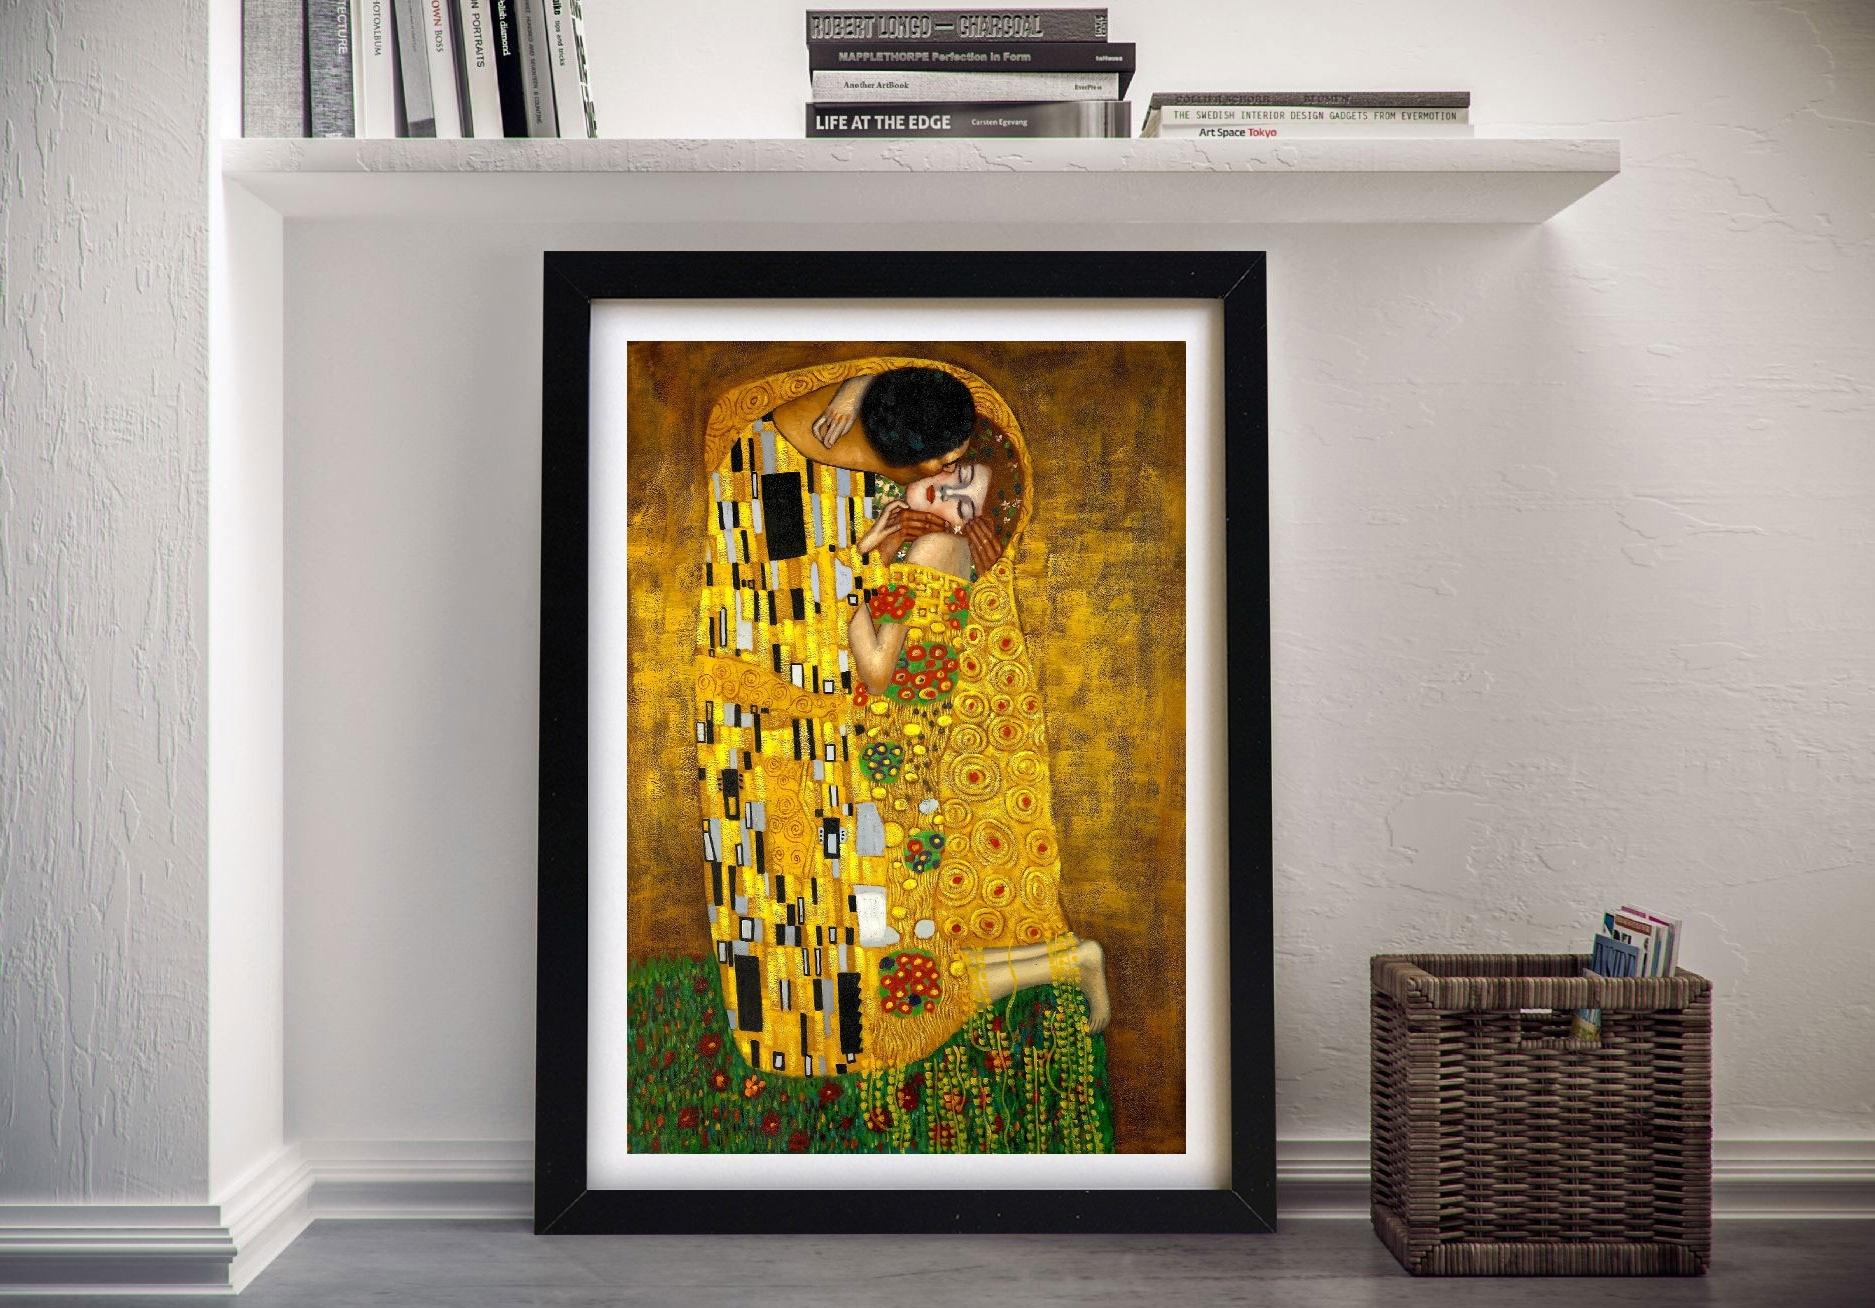 Classical Art Prints | Van Gogh, Monet, Renoir, Klimt Canvas Wall With Most Popular Port Elizabeth Canvas Wall Art (View 9 of 15)